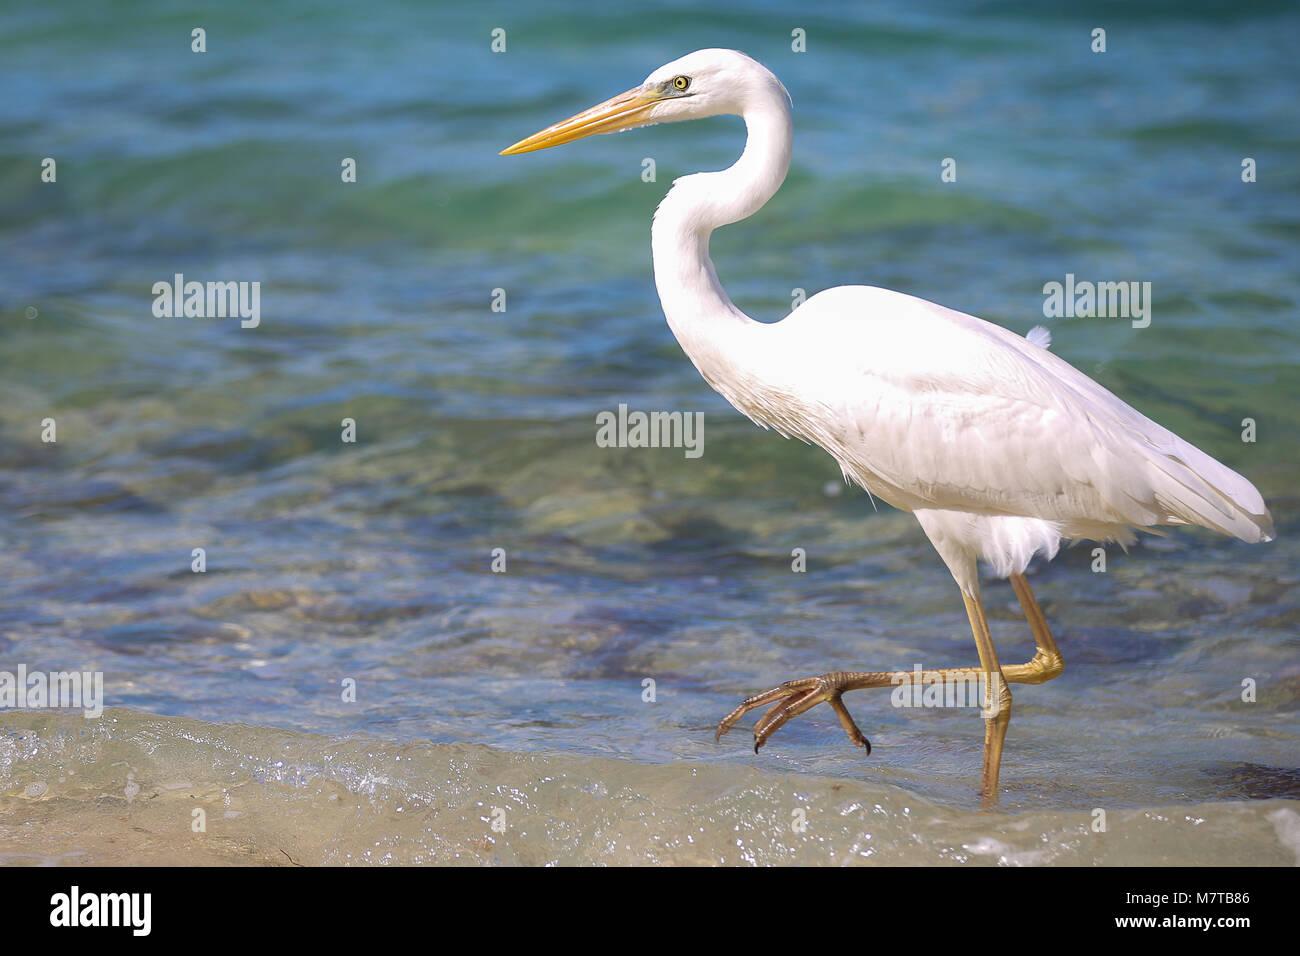 white egret, heron, bird crane playing hunting in the surf of sunset key. - Stock Image